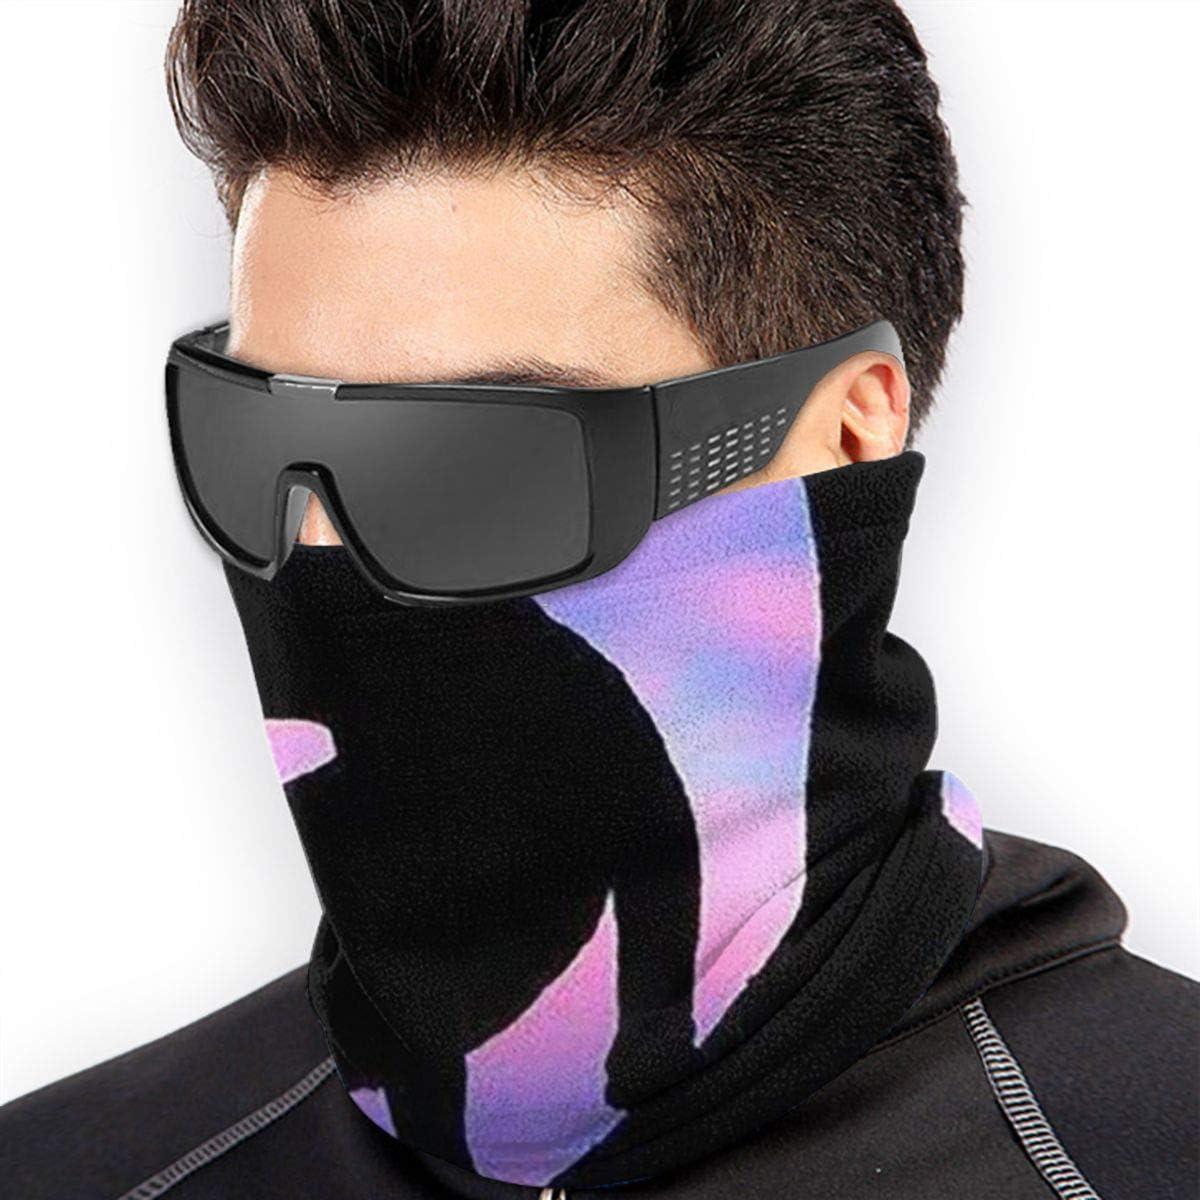 Leopard Neck Gaiter Headwear Headband Head Wrap Scarf Mask Neck/Ear Warmers Headbands Perfect For Winter Fishing, Hiking, Running, Motorcycle Etc& Daily Wear For Men And Women